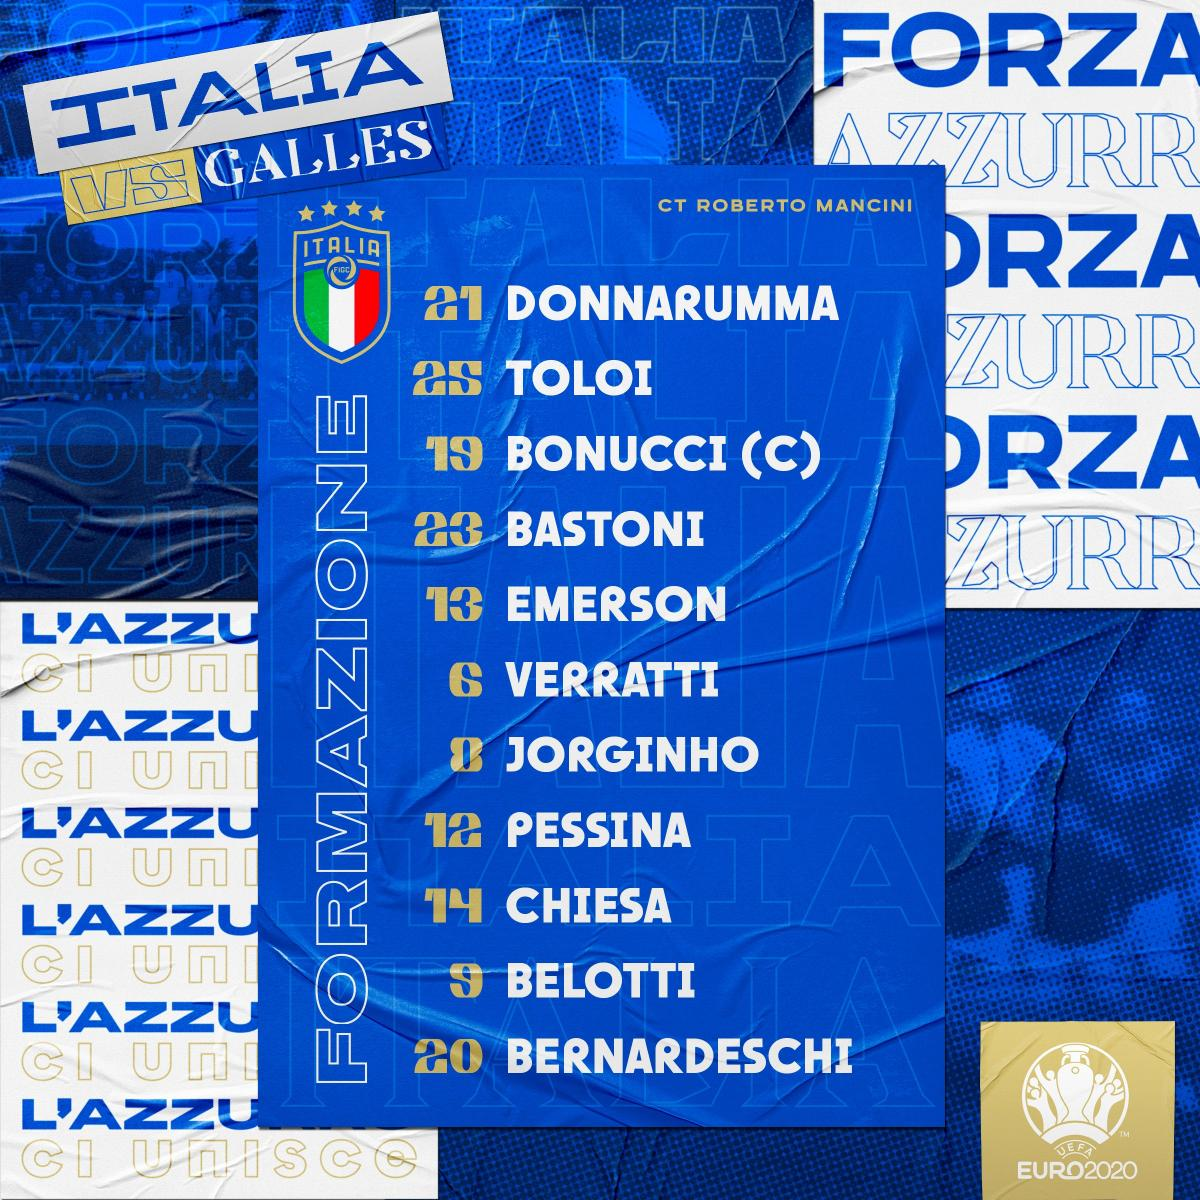 Twitter: Nazionale Italiana oficial